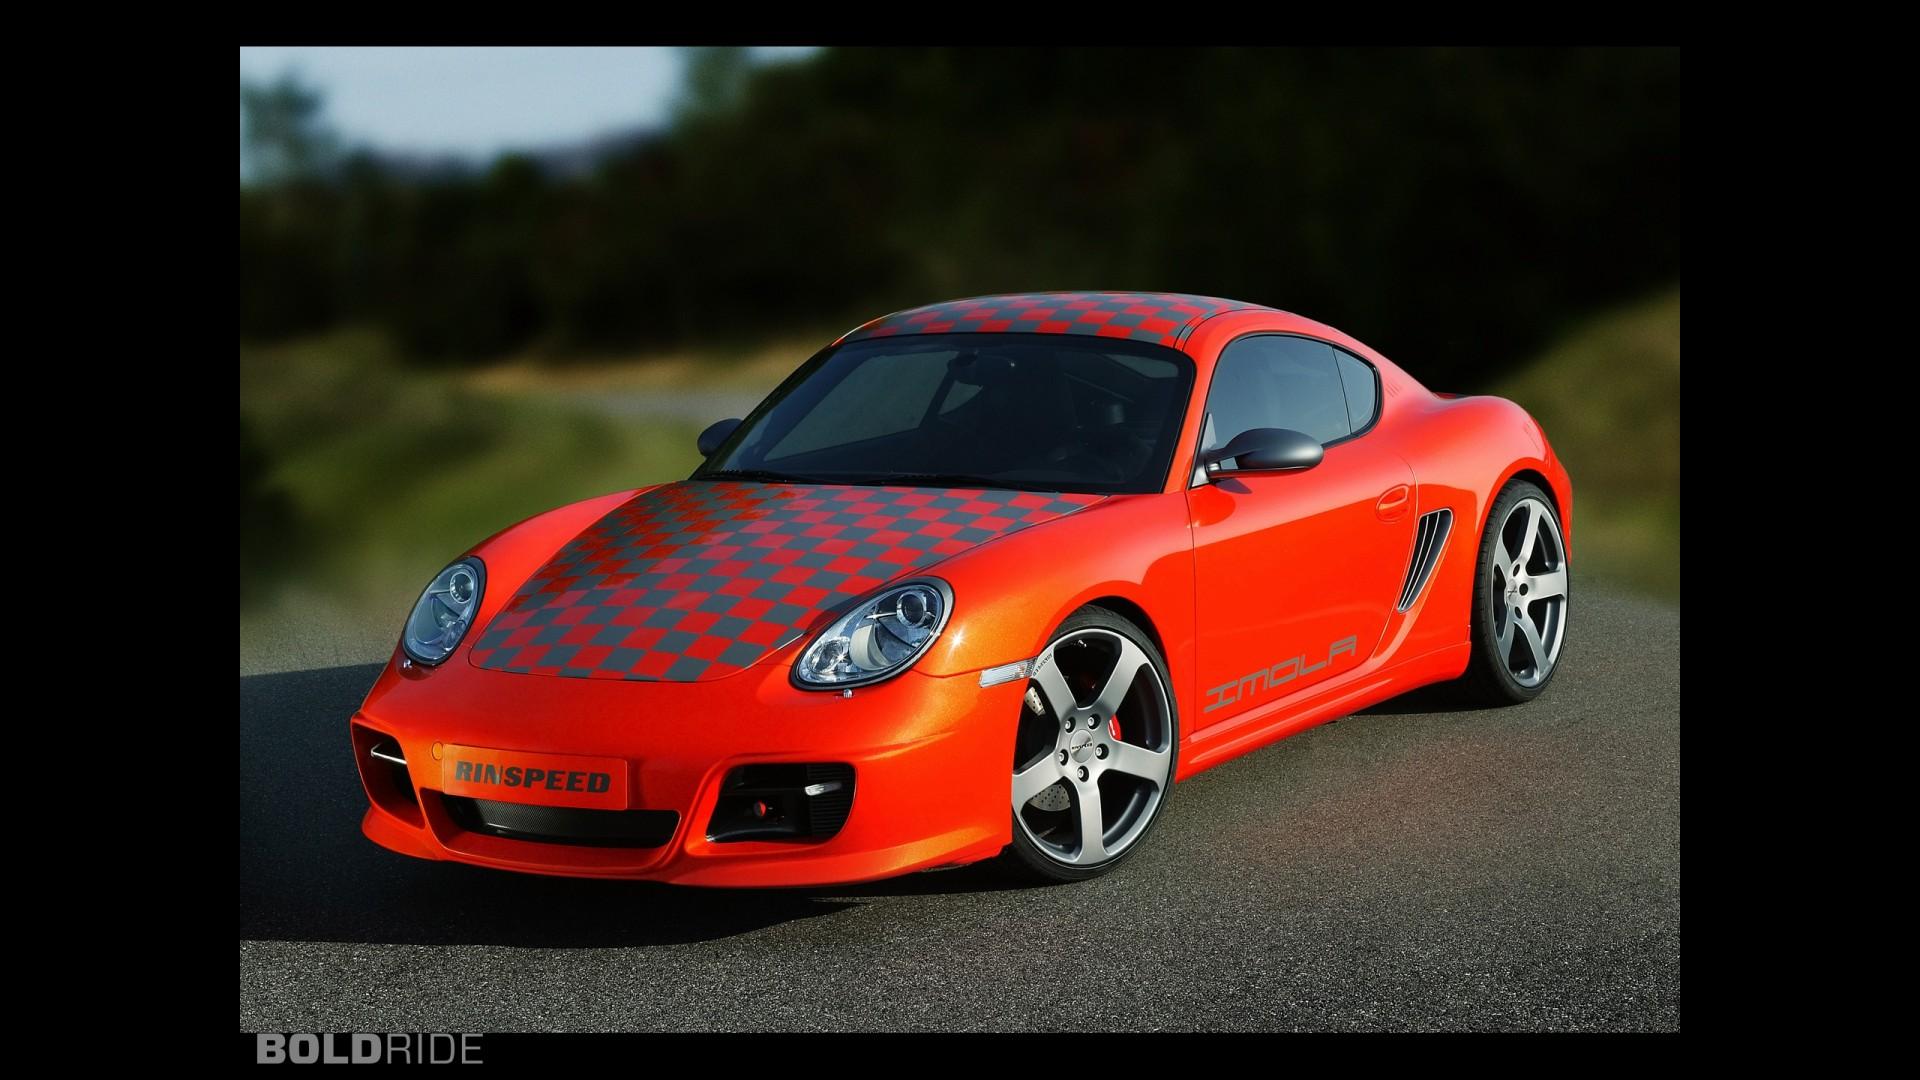 Rinspeed Porsche Imola Cayman 987